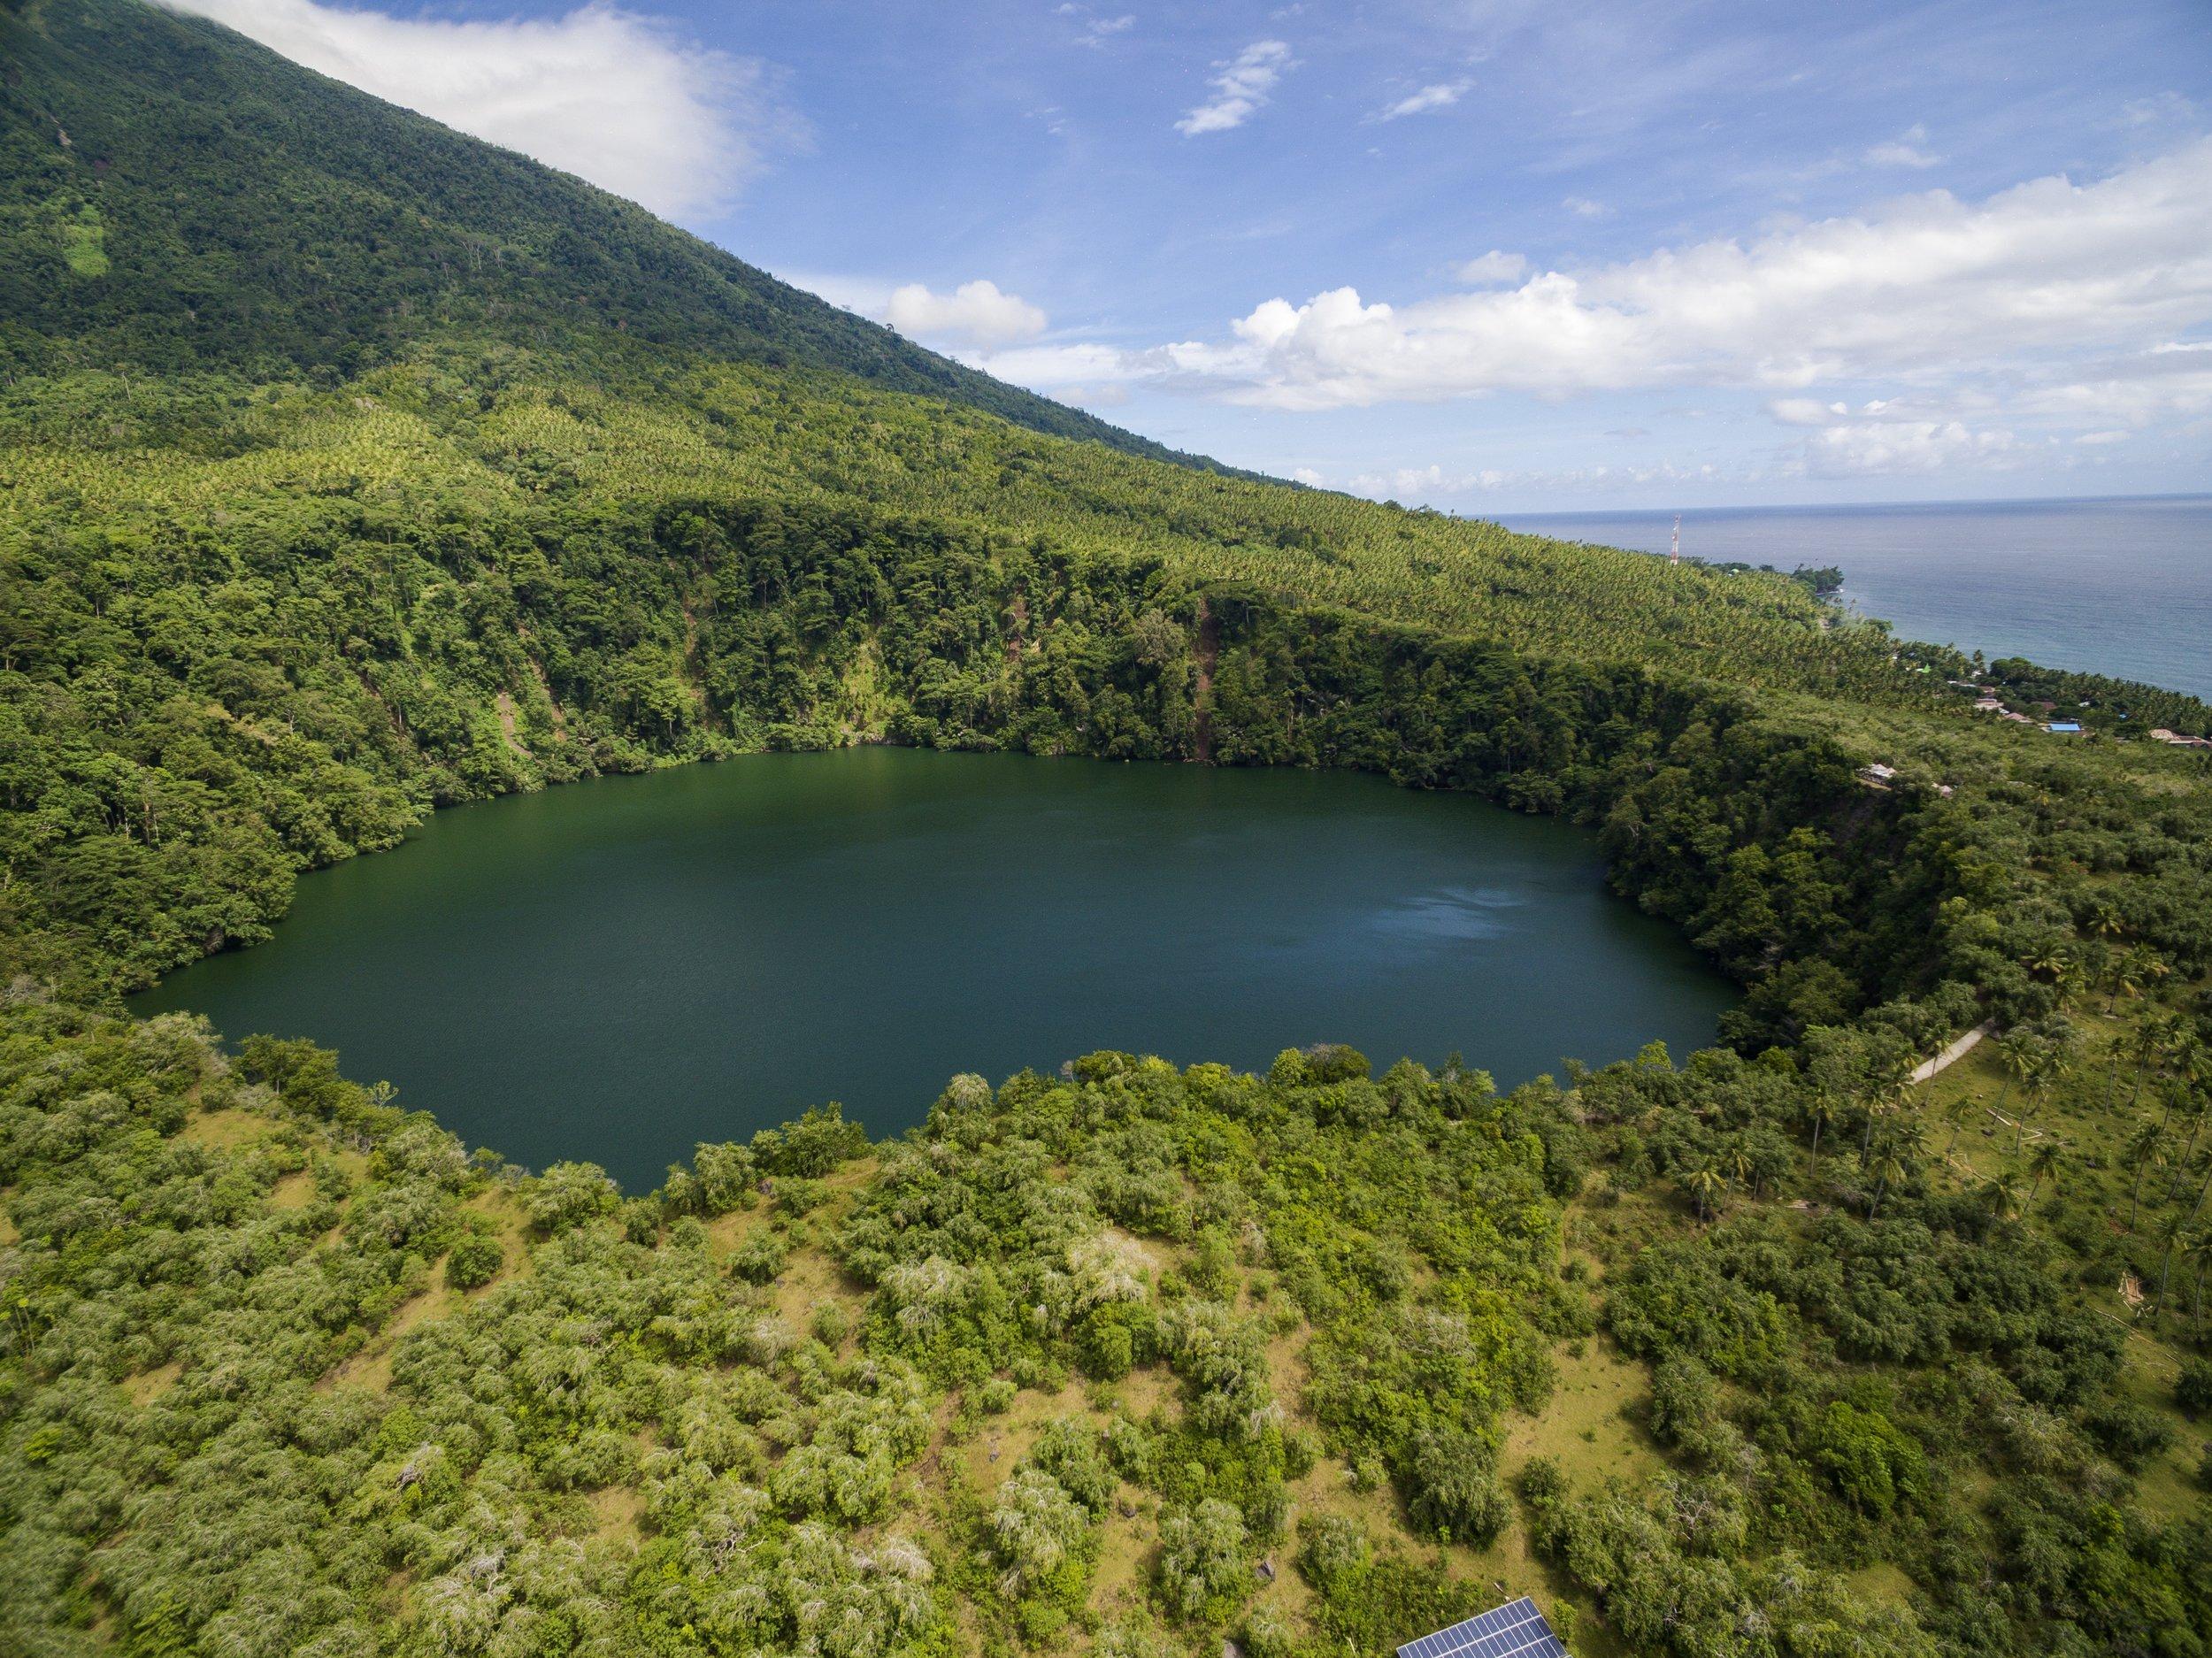 Asoka Remadja - Danau Ngade, Ternate - Maluku Utara 4.jpg